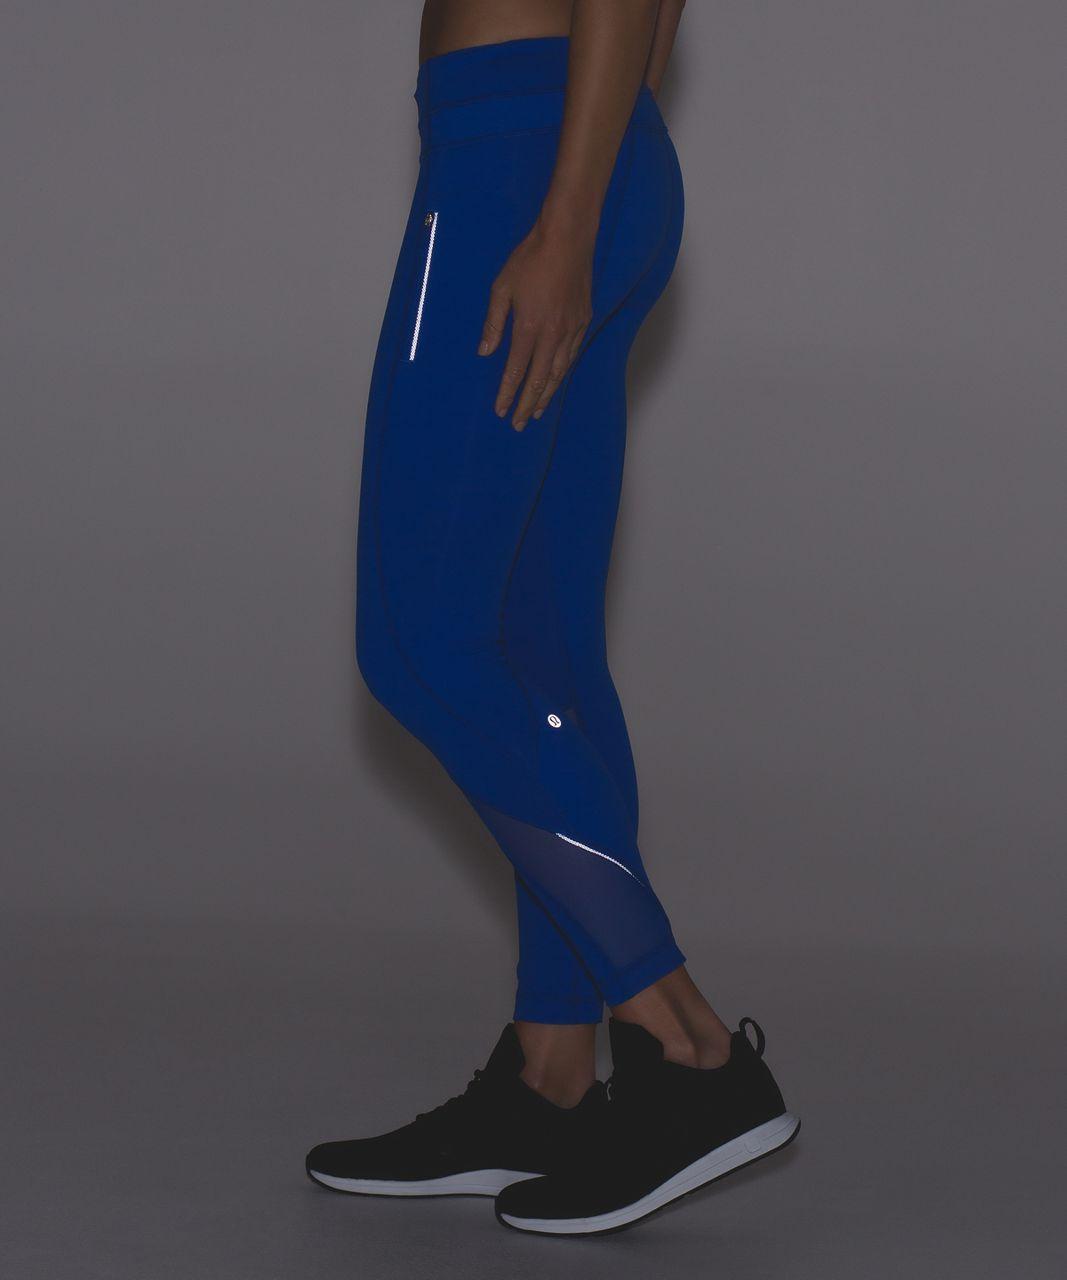 Lululemon Inspire Tight II - Cerulean Blue